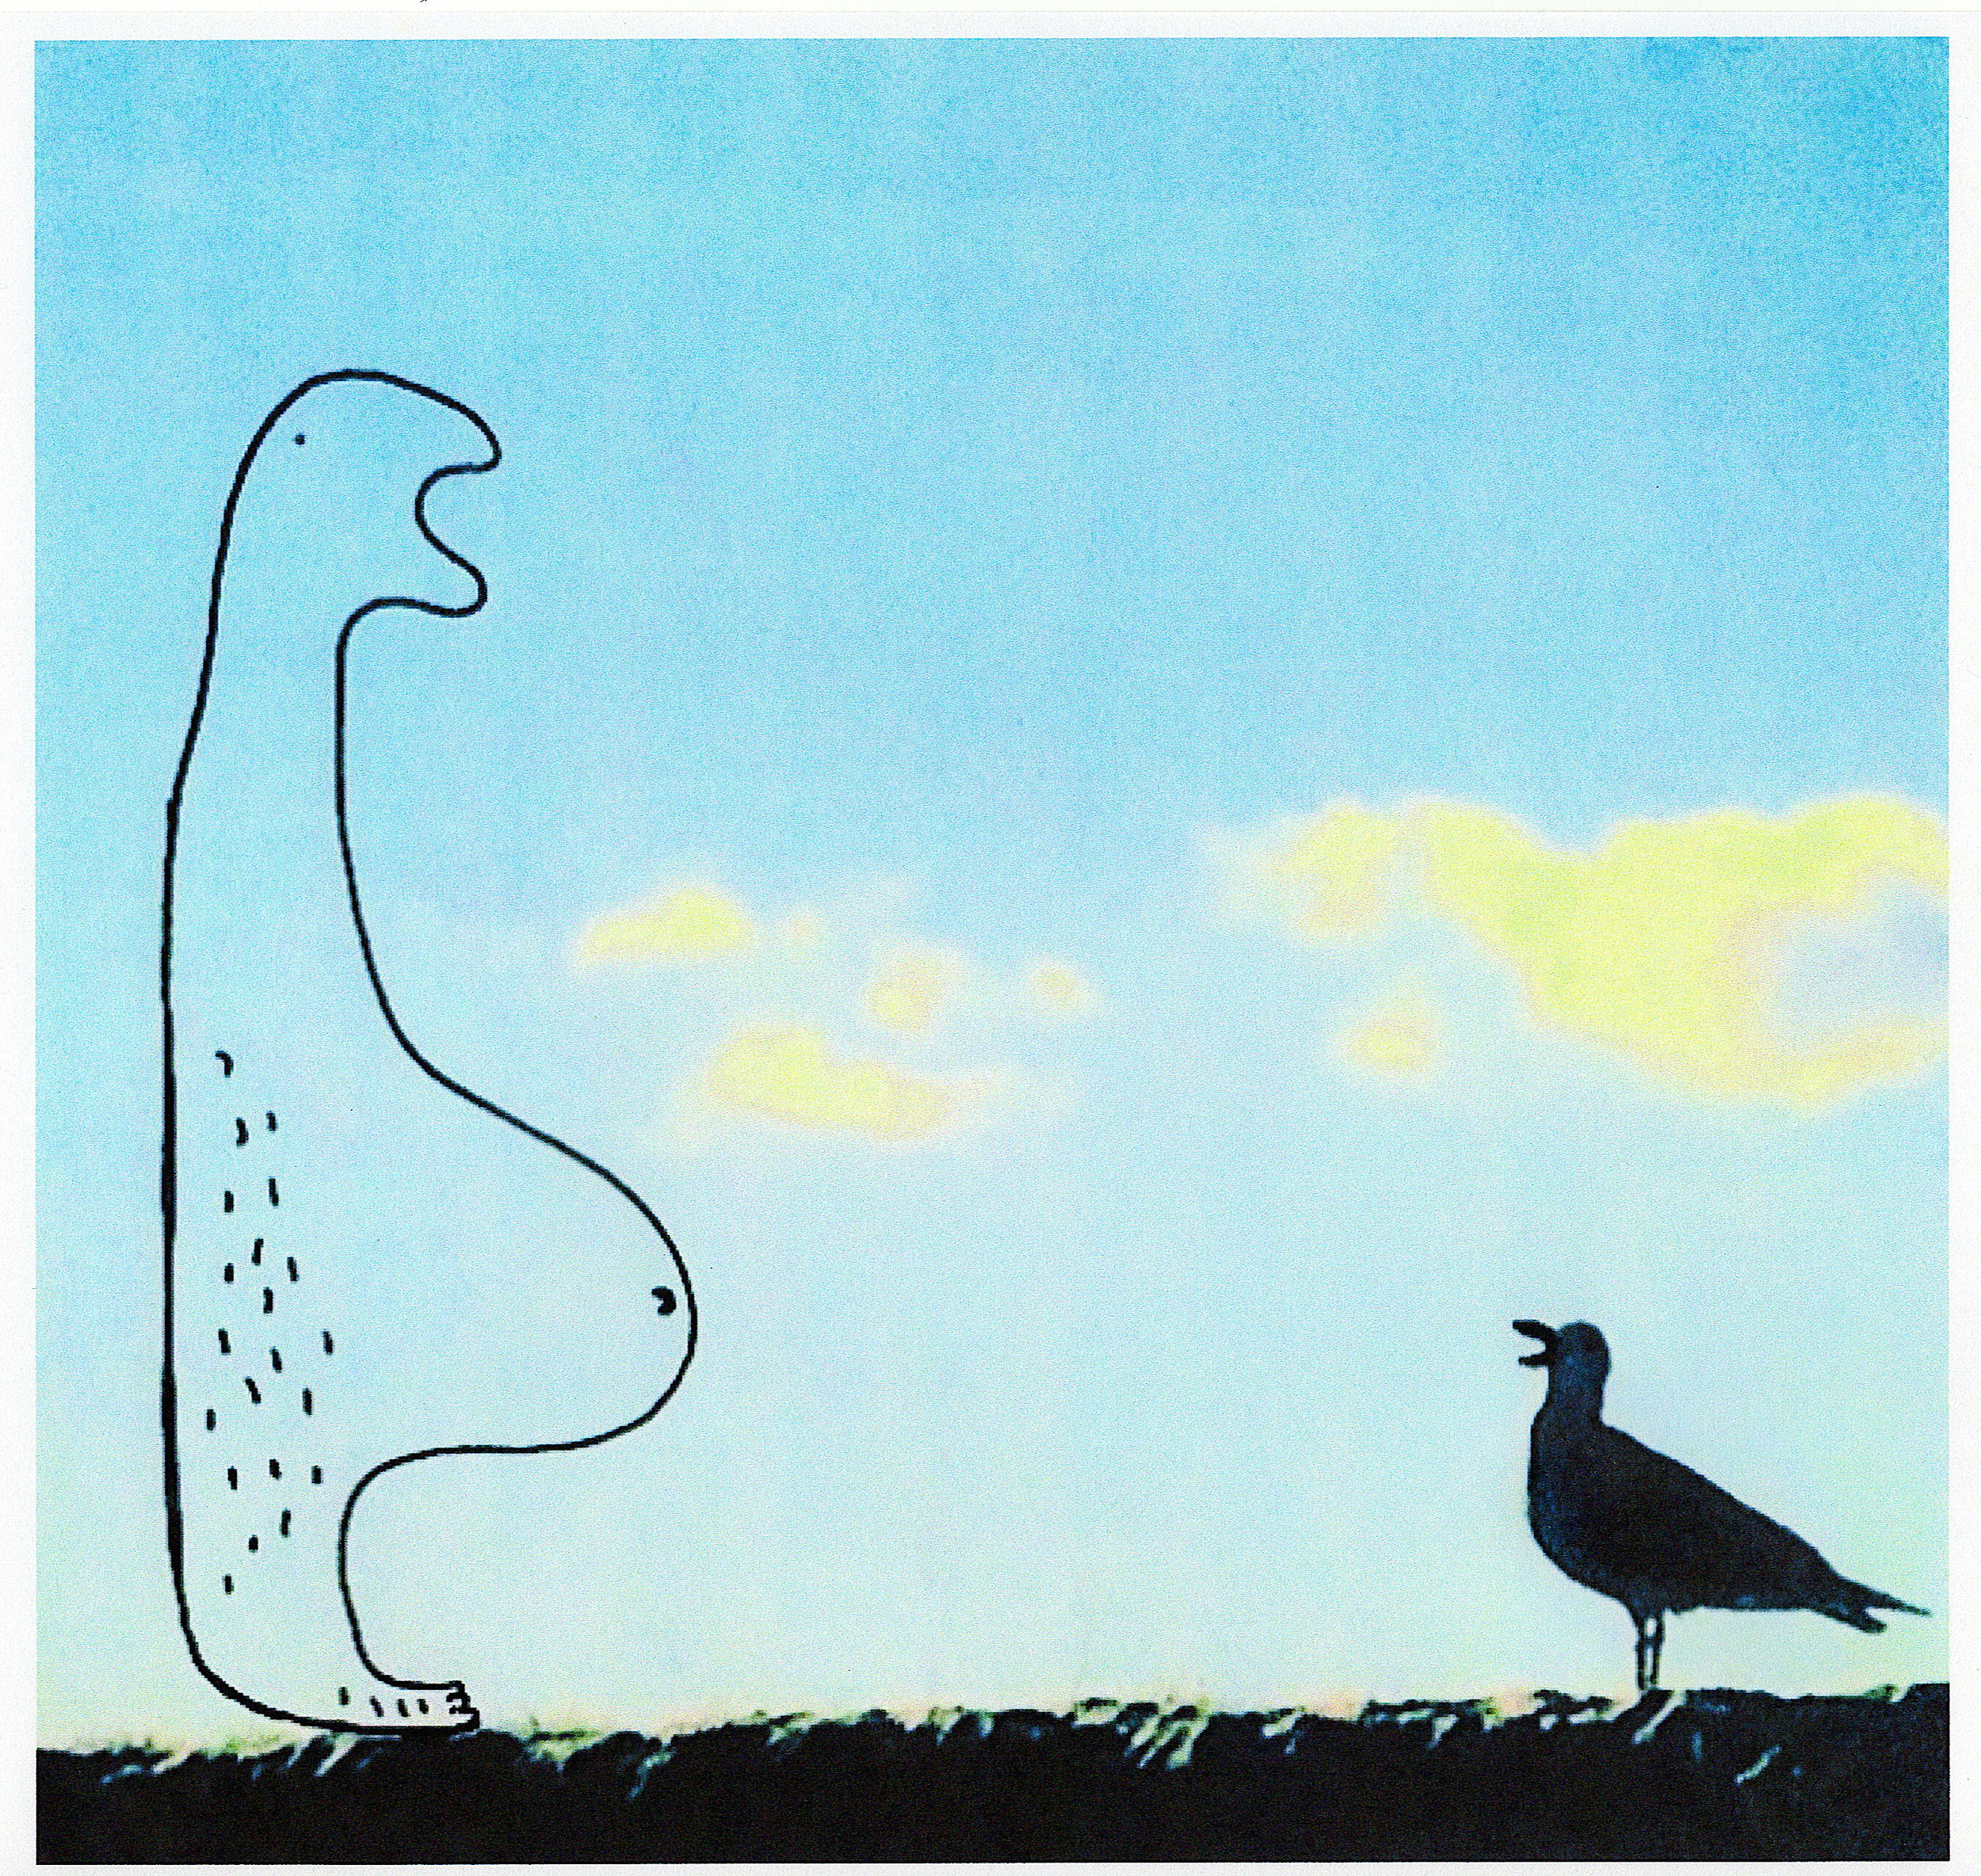 Bird and Creature